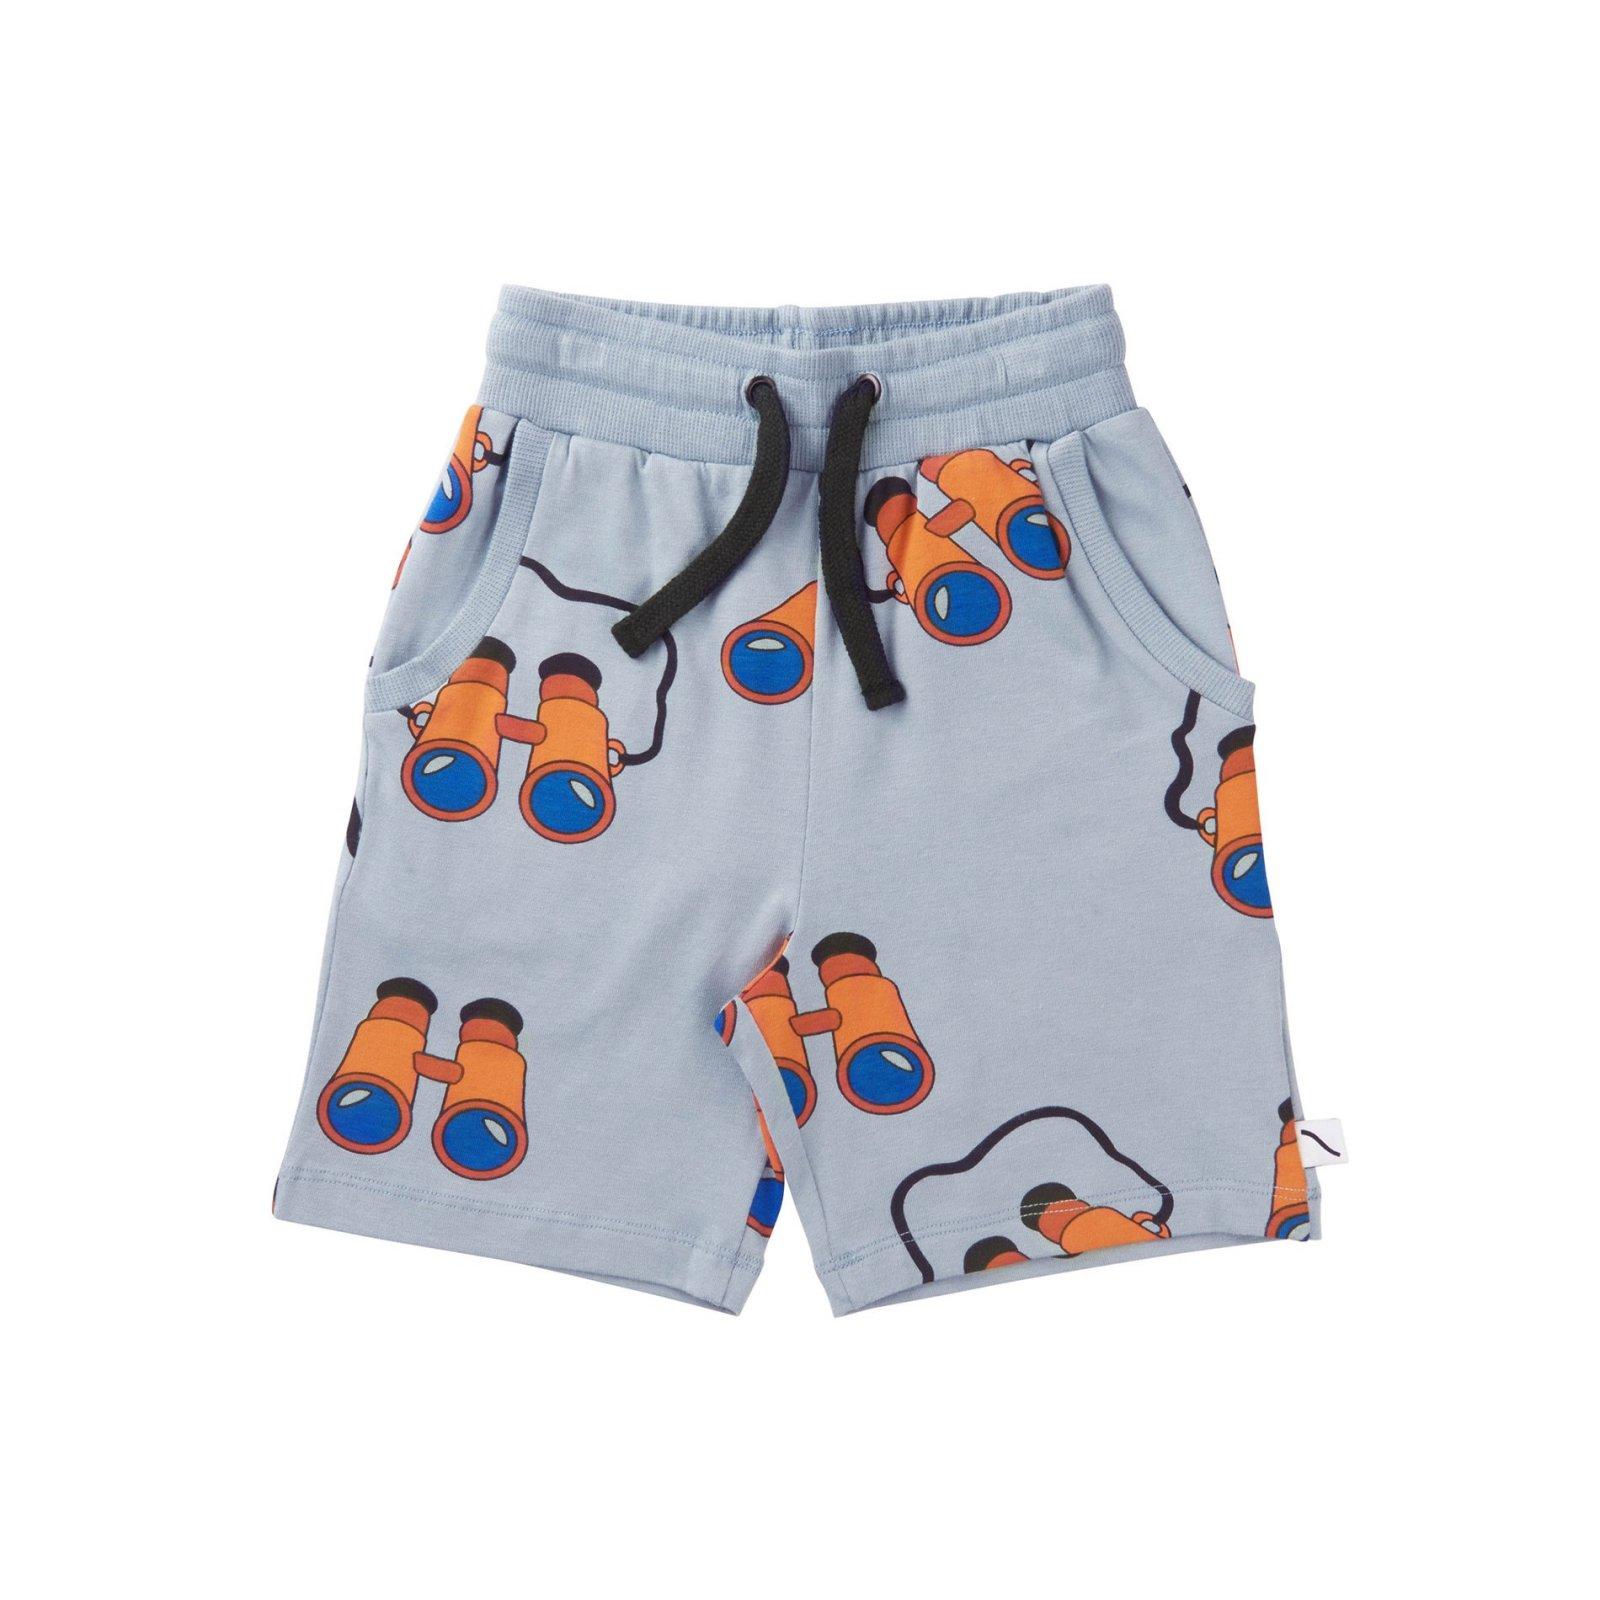 I Spy Shorts by CarlijnQ